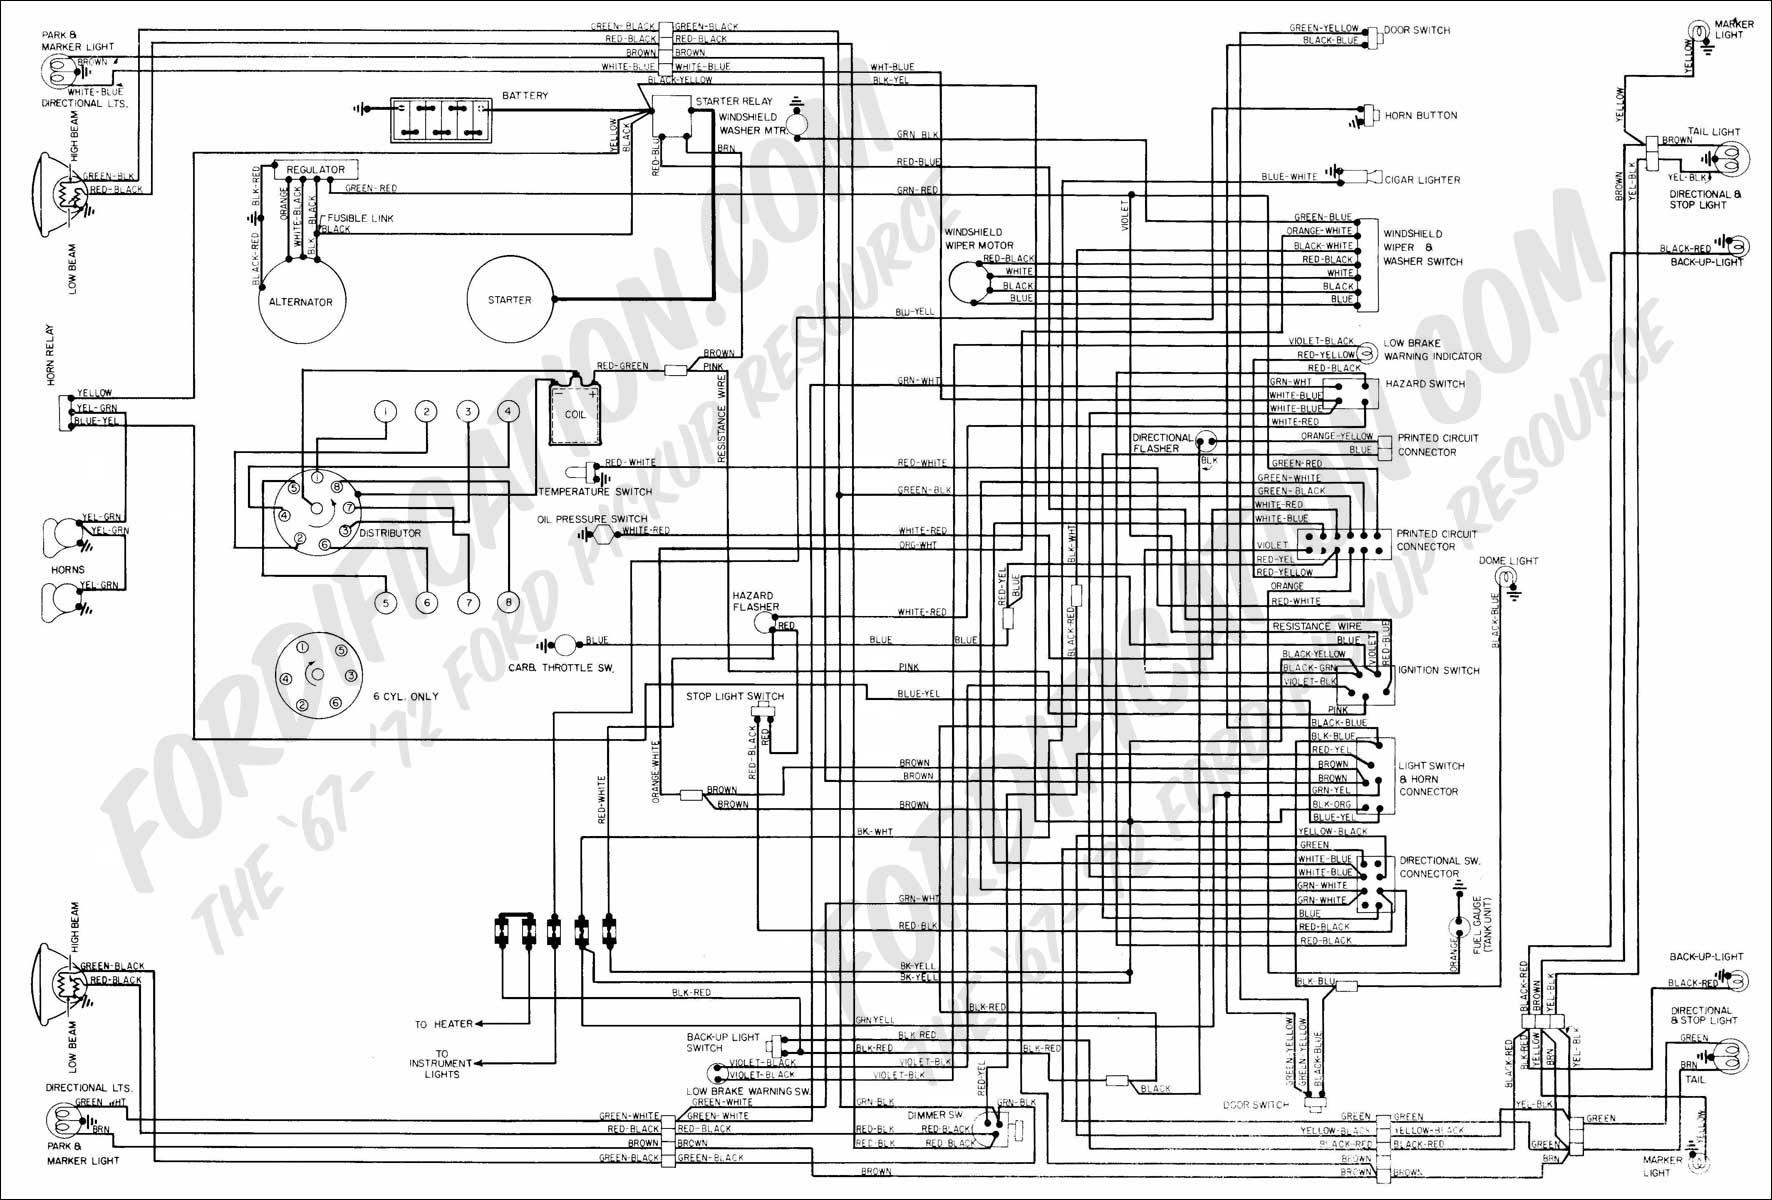 iphone 5 wiring diagram